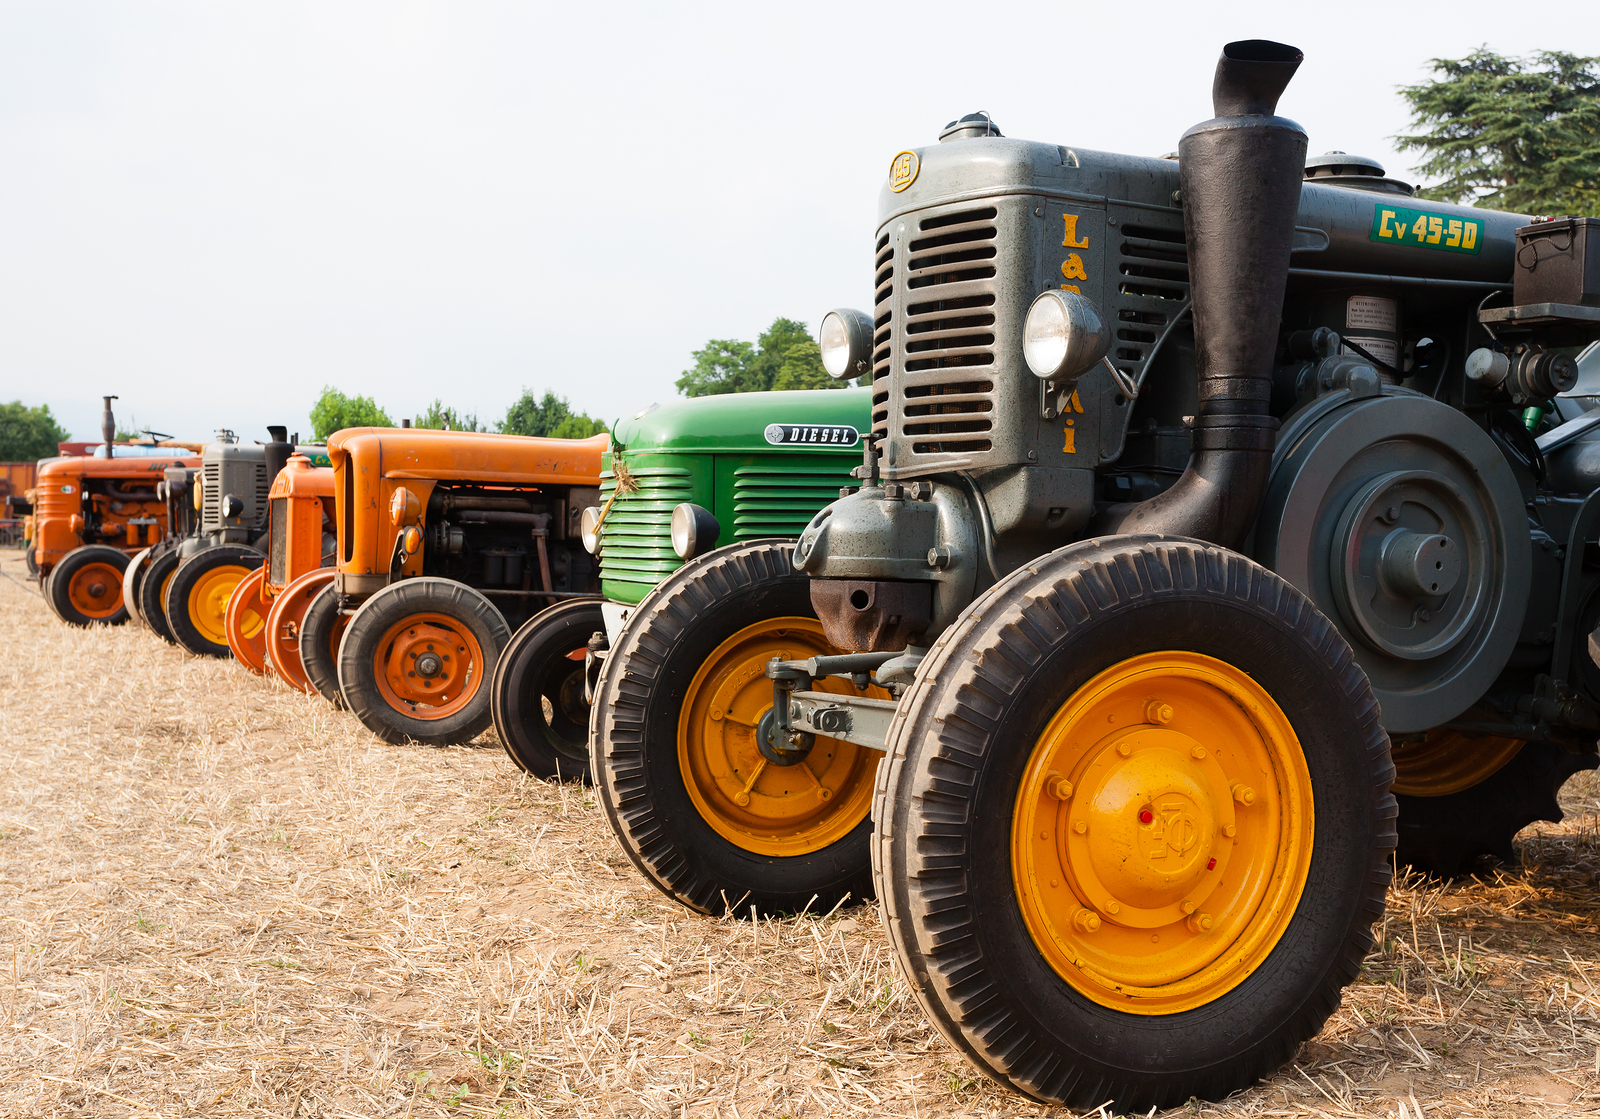 CE Kiff tractor lubricants